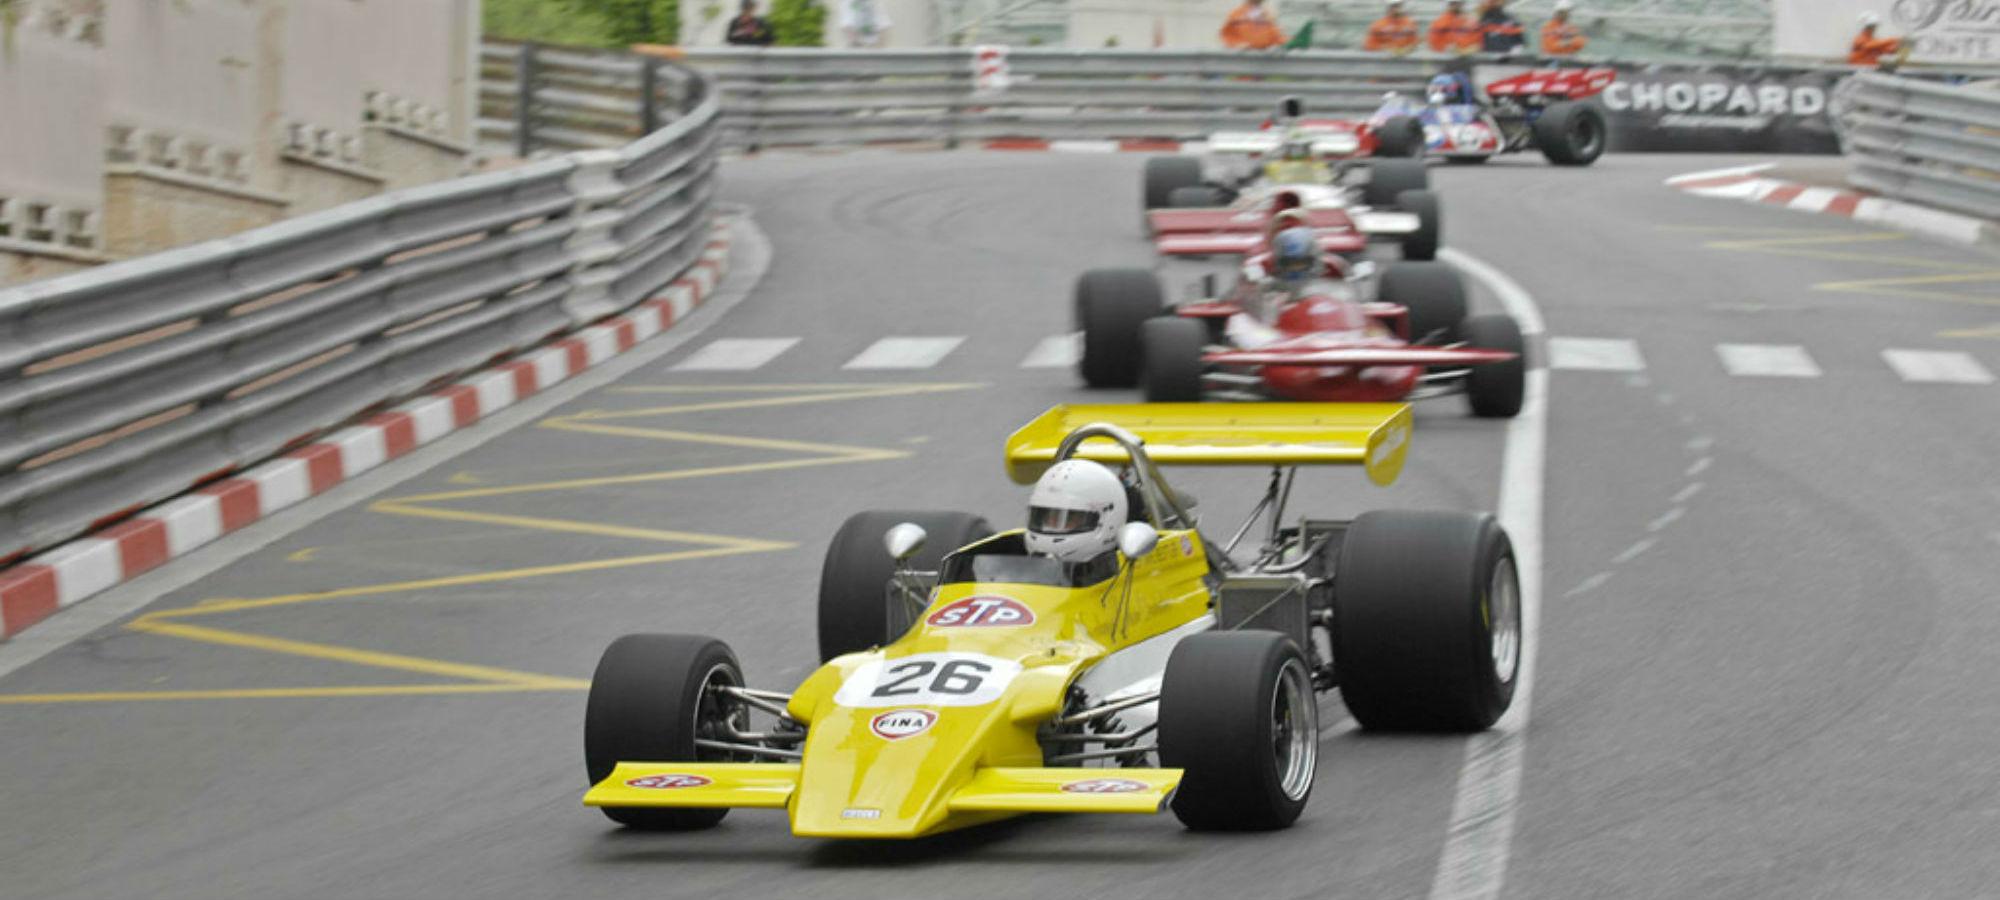 1972 March 721G Formula 1 Ex - Mike Beuttler, David Purley, Reine Wissel